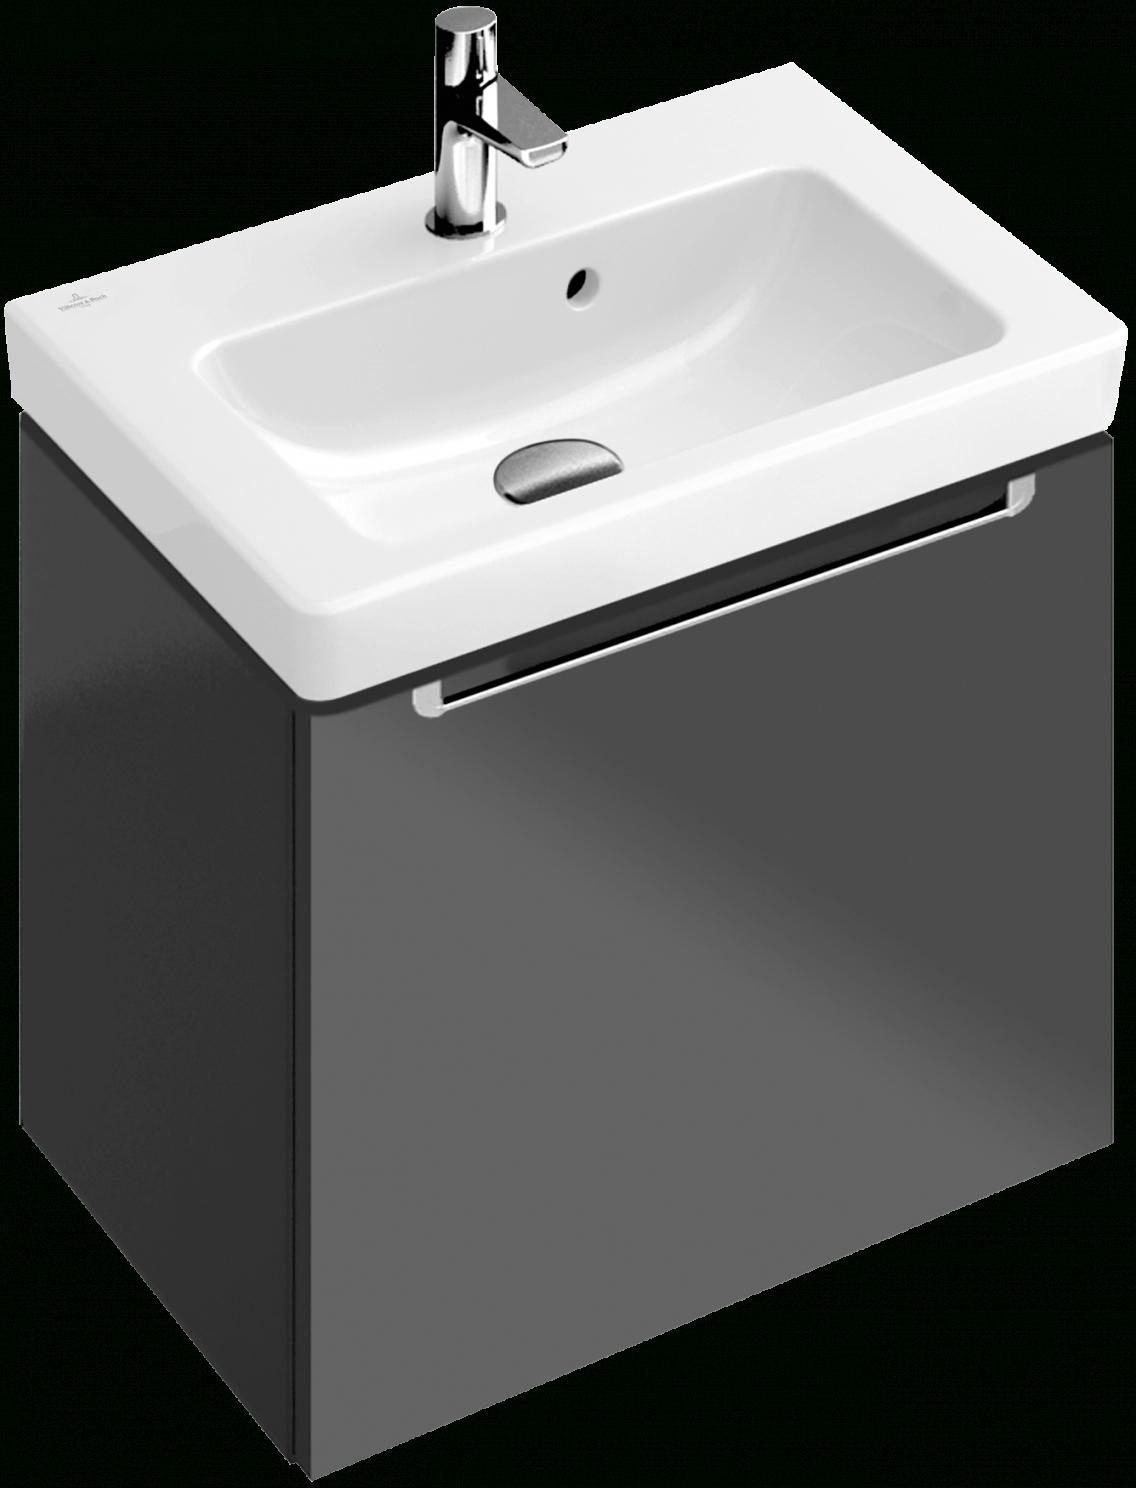 Subway 20 Waschtischunterschrank A68500  Villeroy & Boch von Villeroy Und Boch Waschtisch Mit Unterschrank Bild